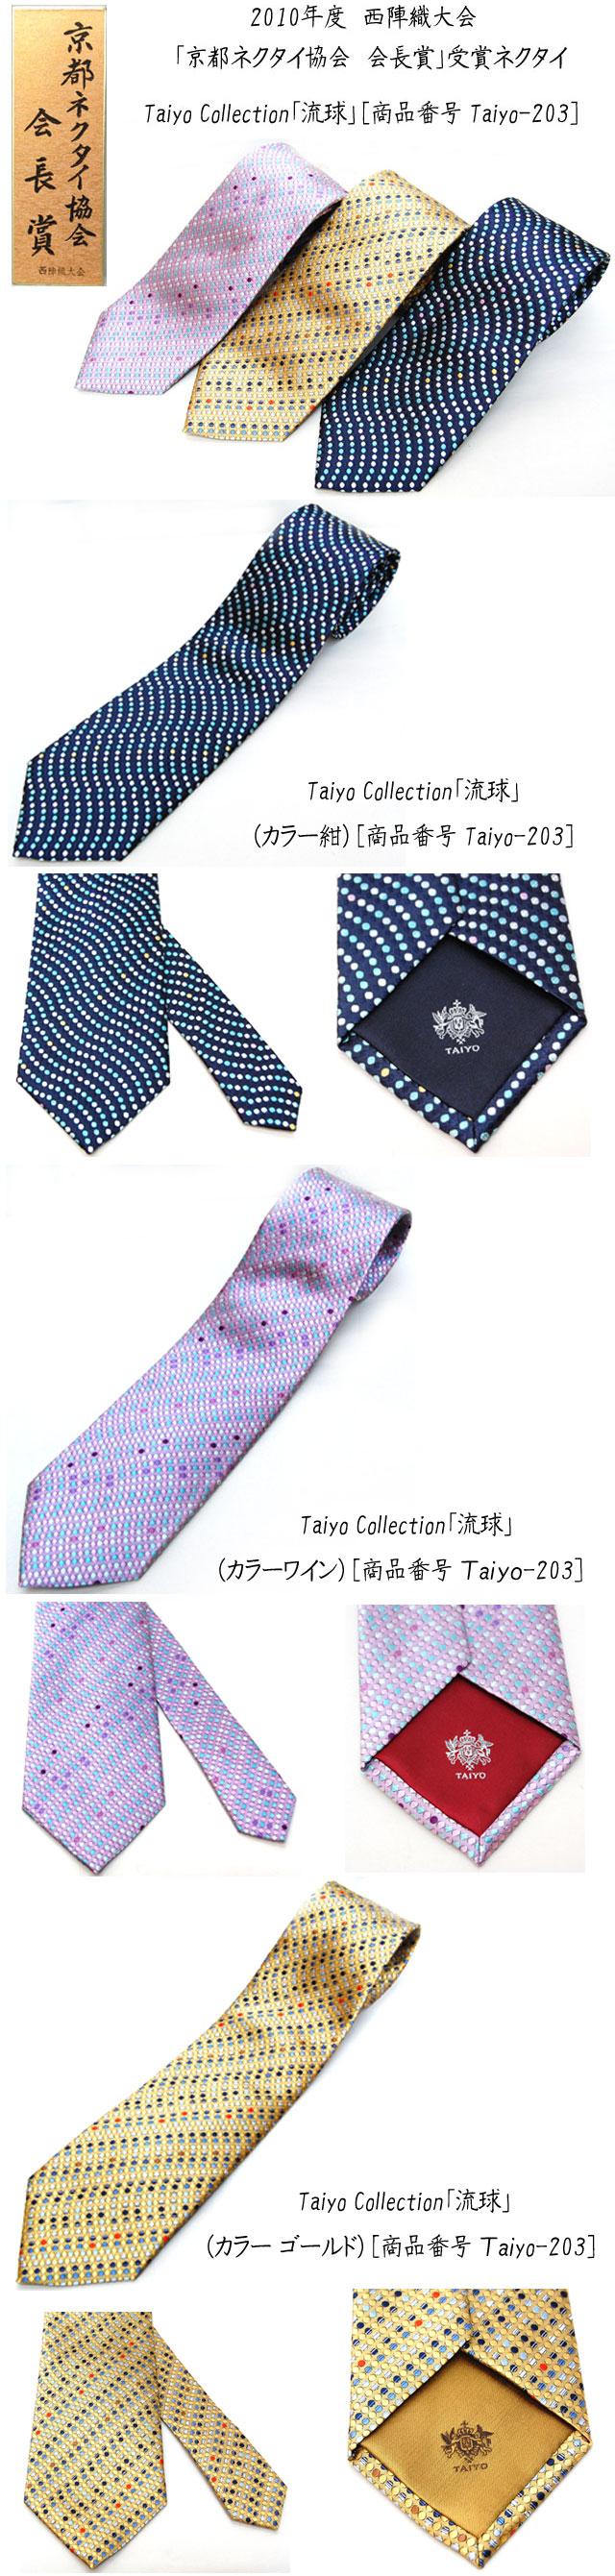 taiyo203-2